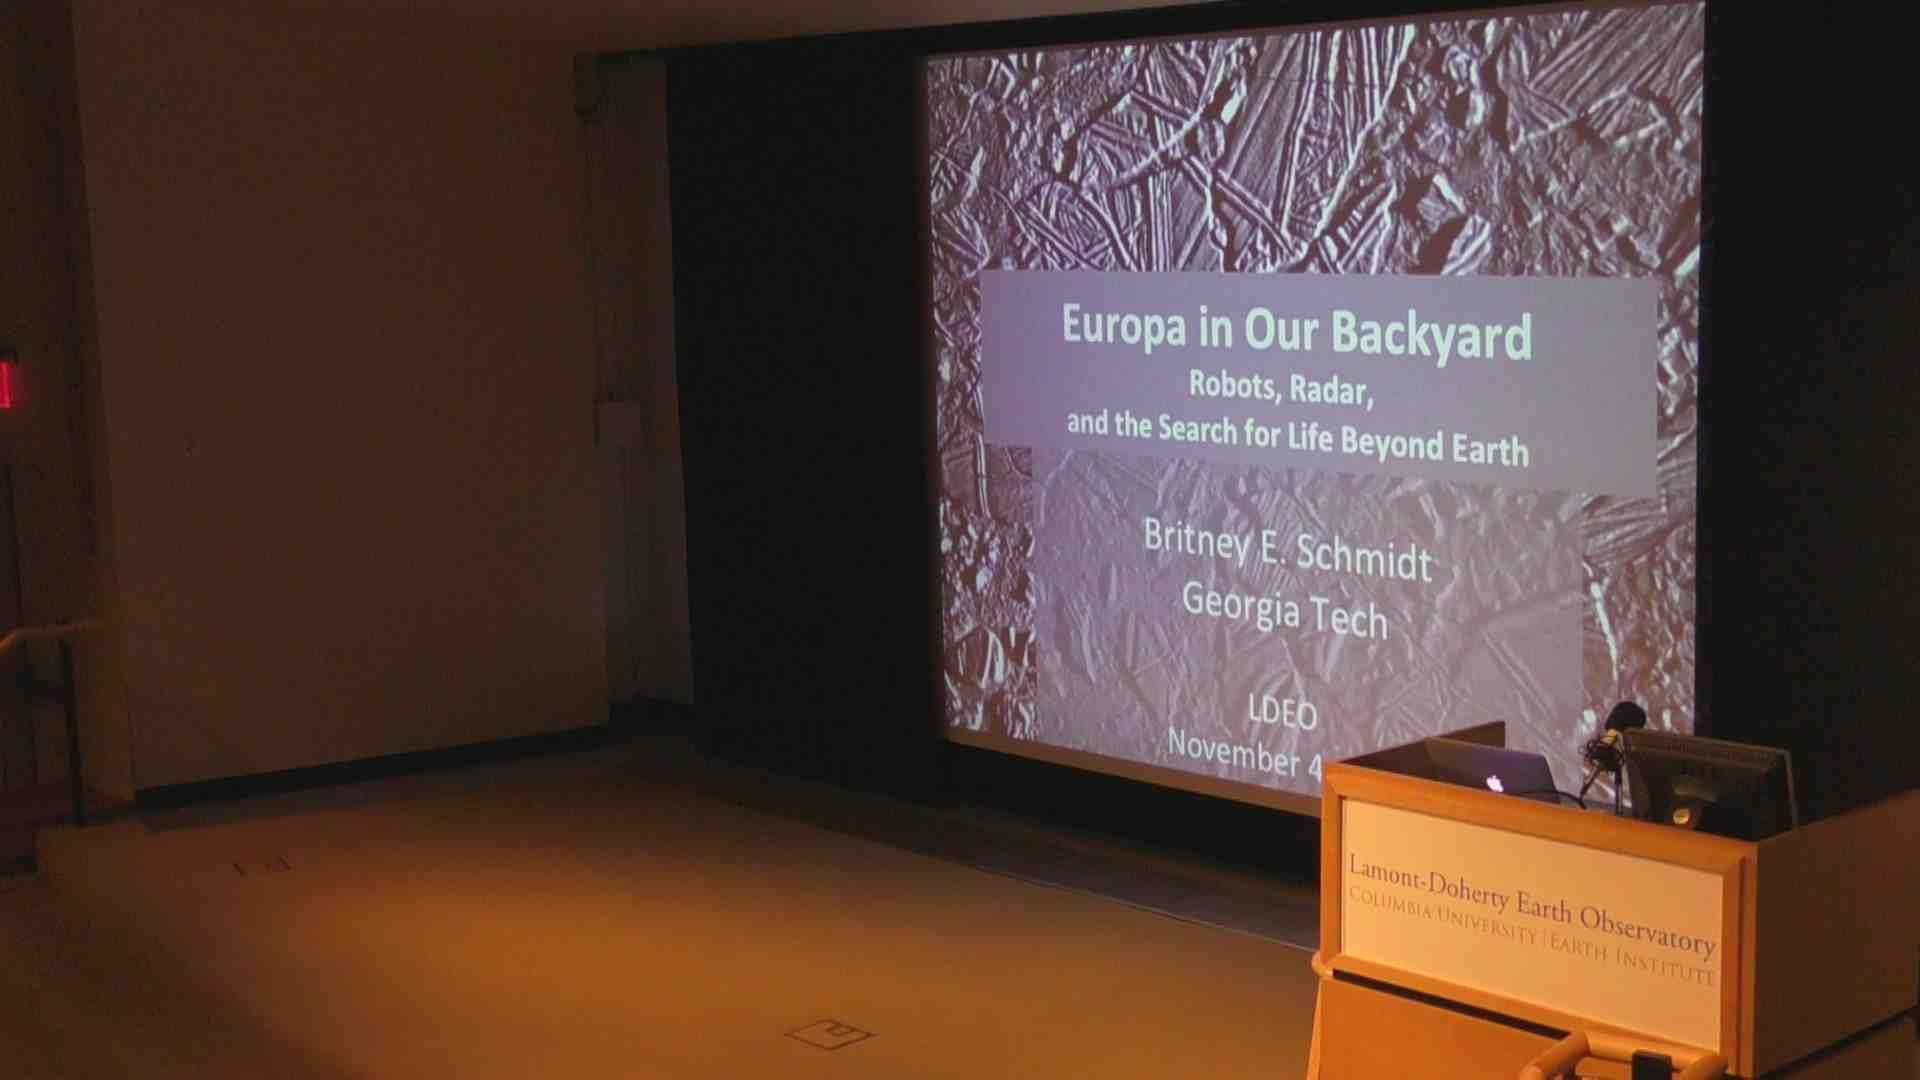 dr britney schmidt europa in our backyard robots radar and